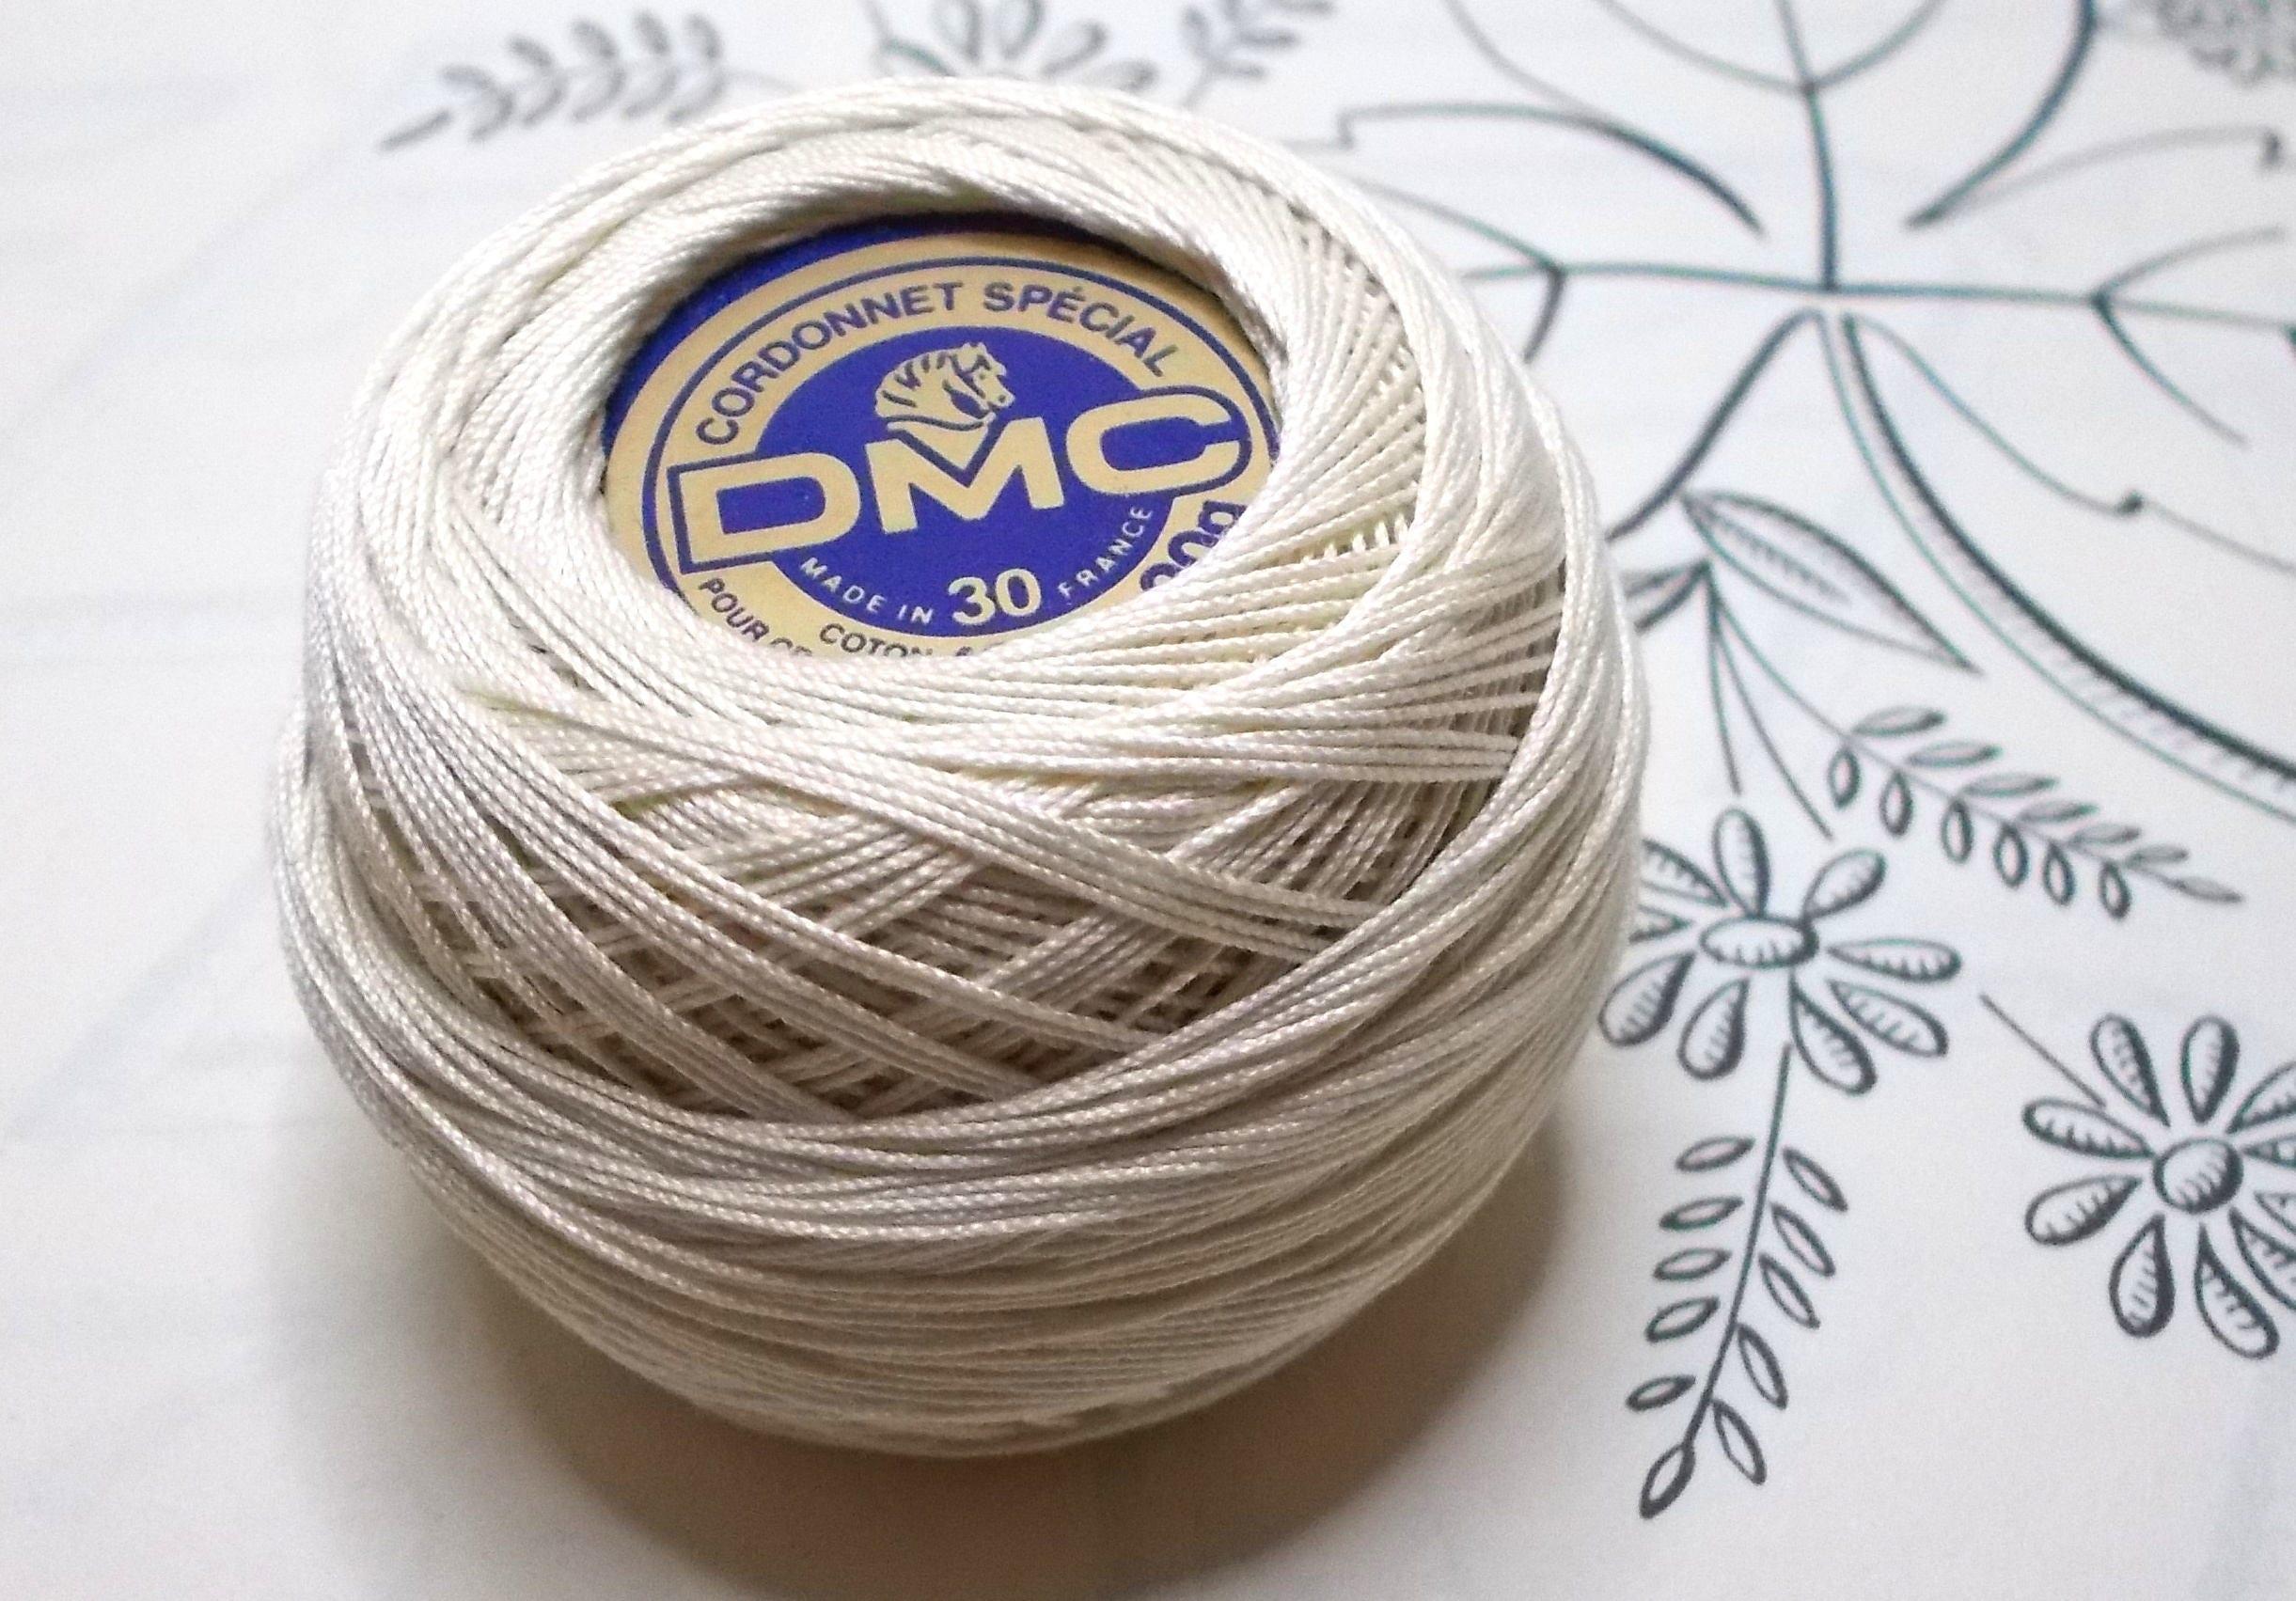 Dmc Embroidery Or Crochet Thread In Ecru Naturel Cordonnet Etsy